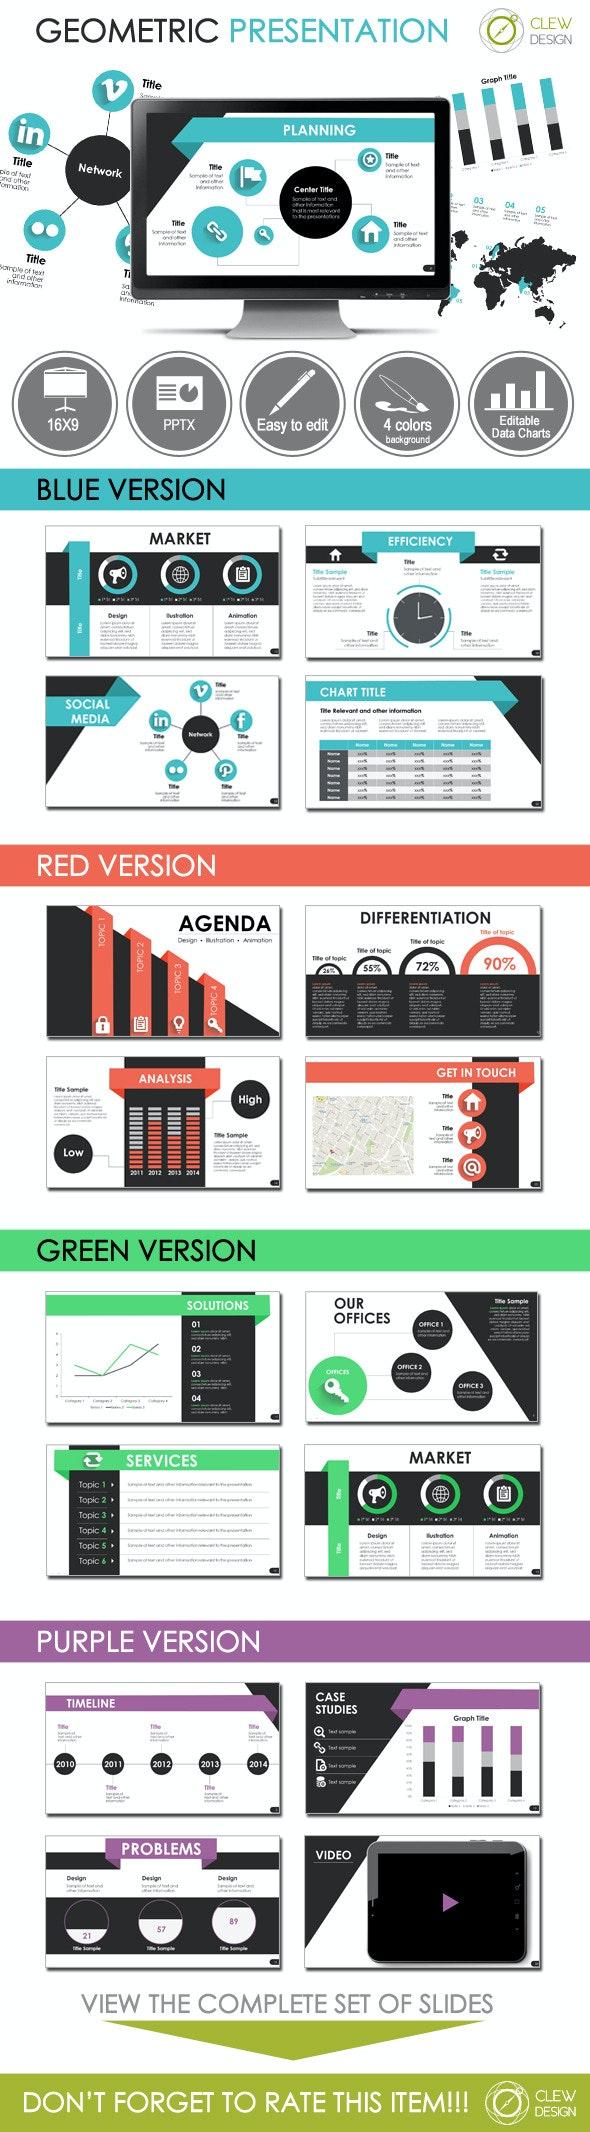 Geometric Presentation Template - PowerPoint Templates Presentation Templates